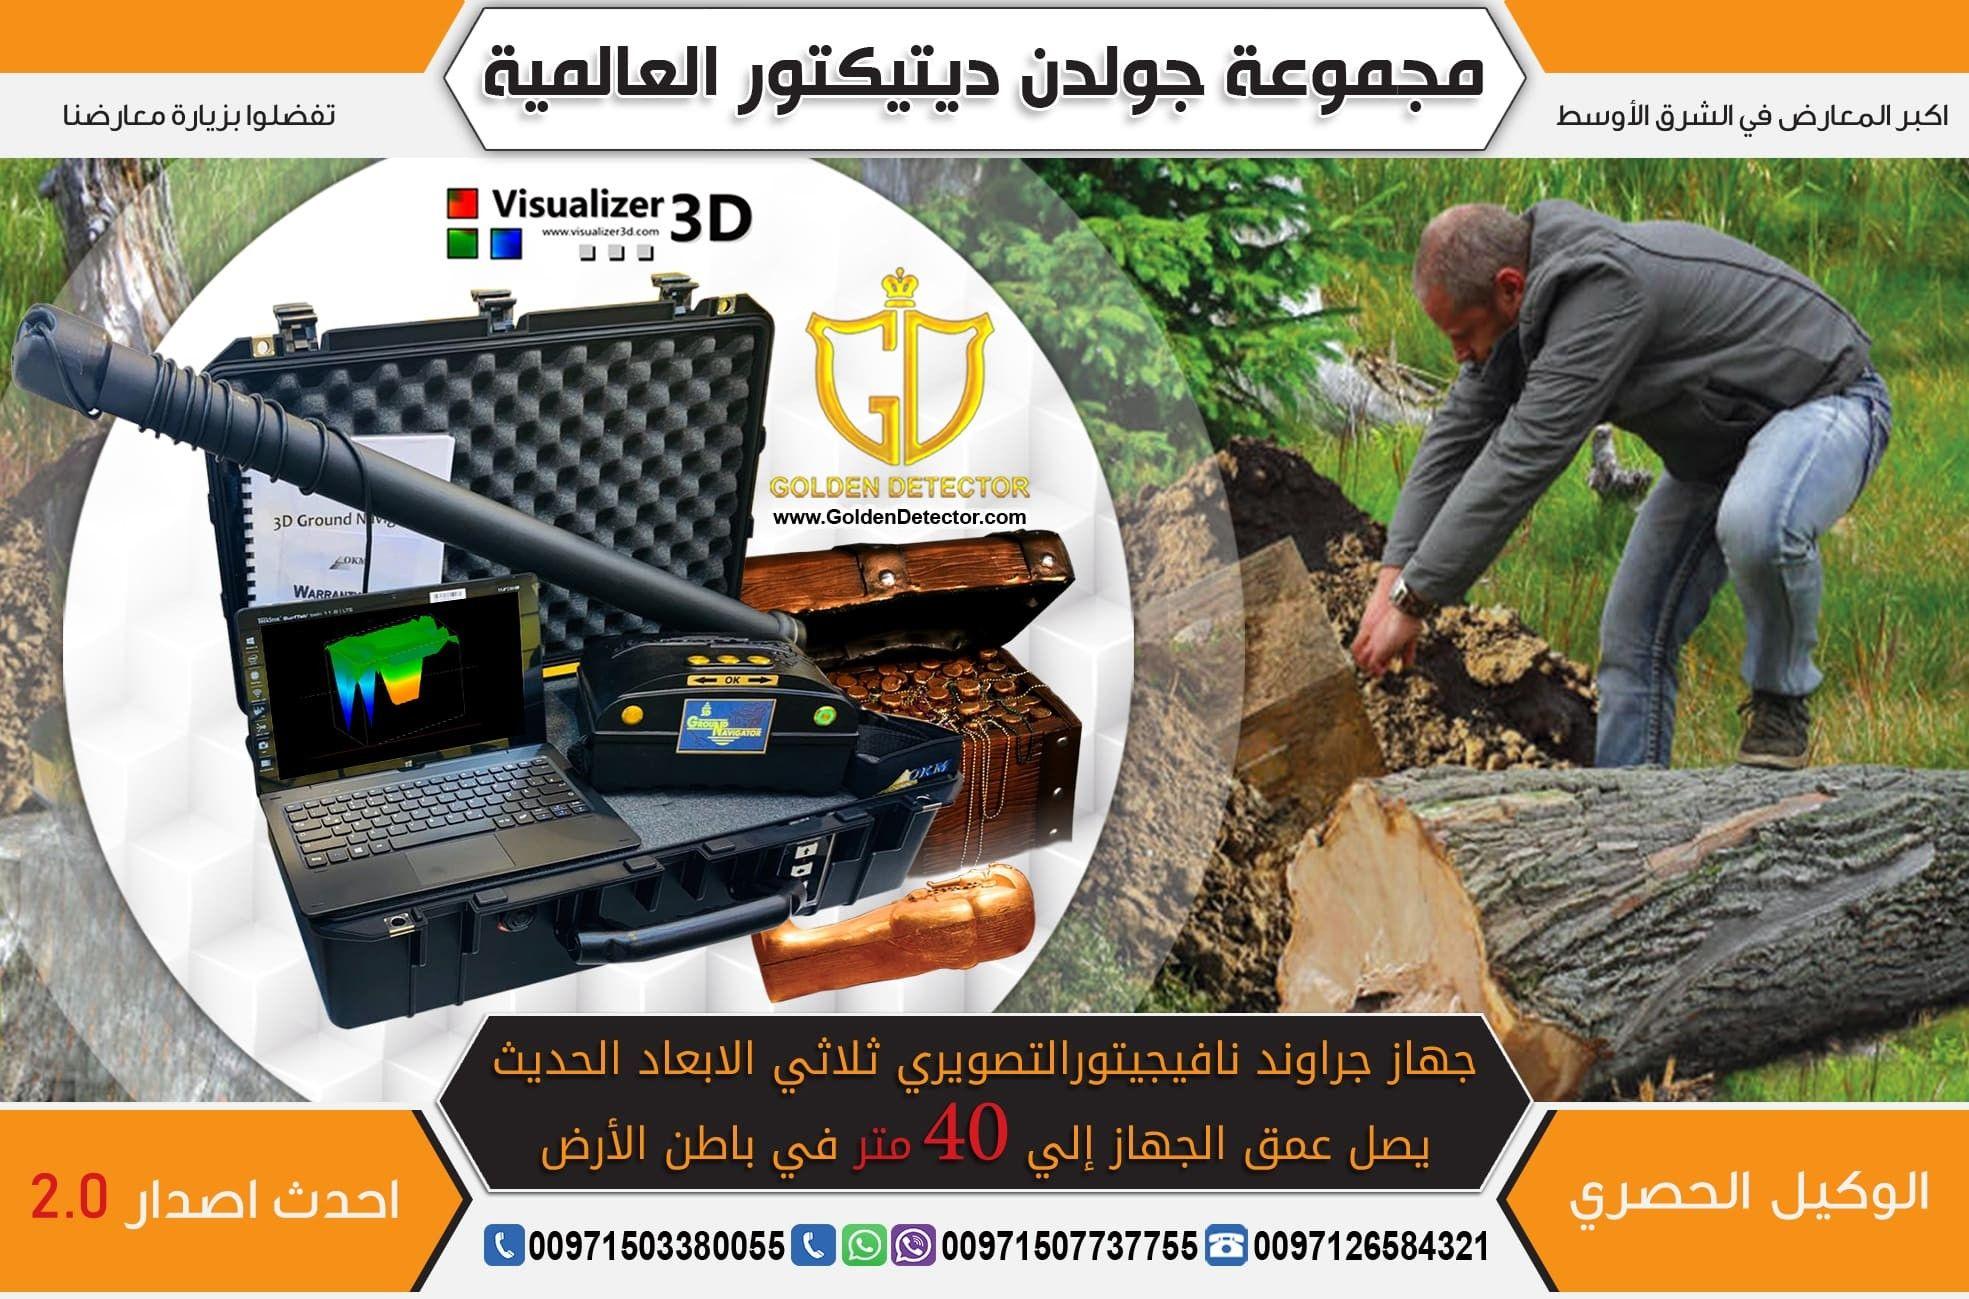 جهاز كشف الذهب والدفائن والكنوز في باطن الارض Dubai Abu Dhabi Dubai Uae